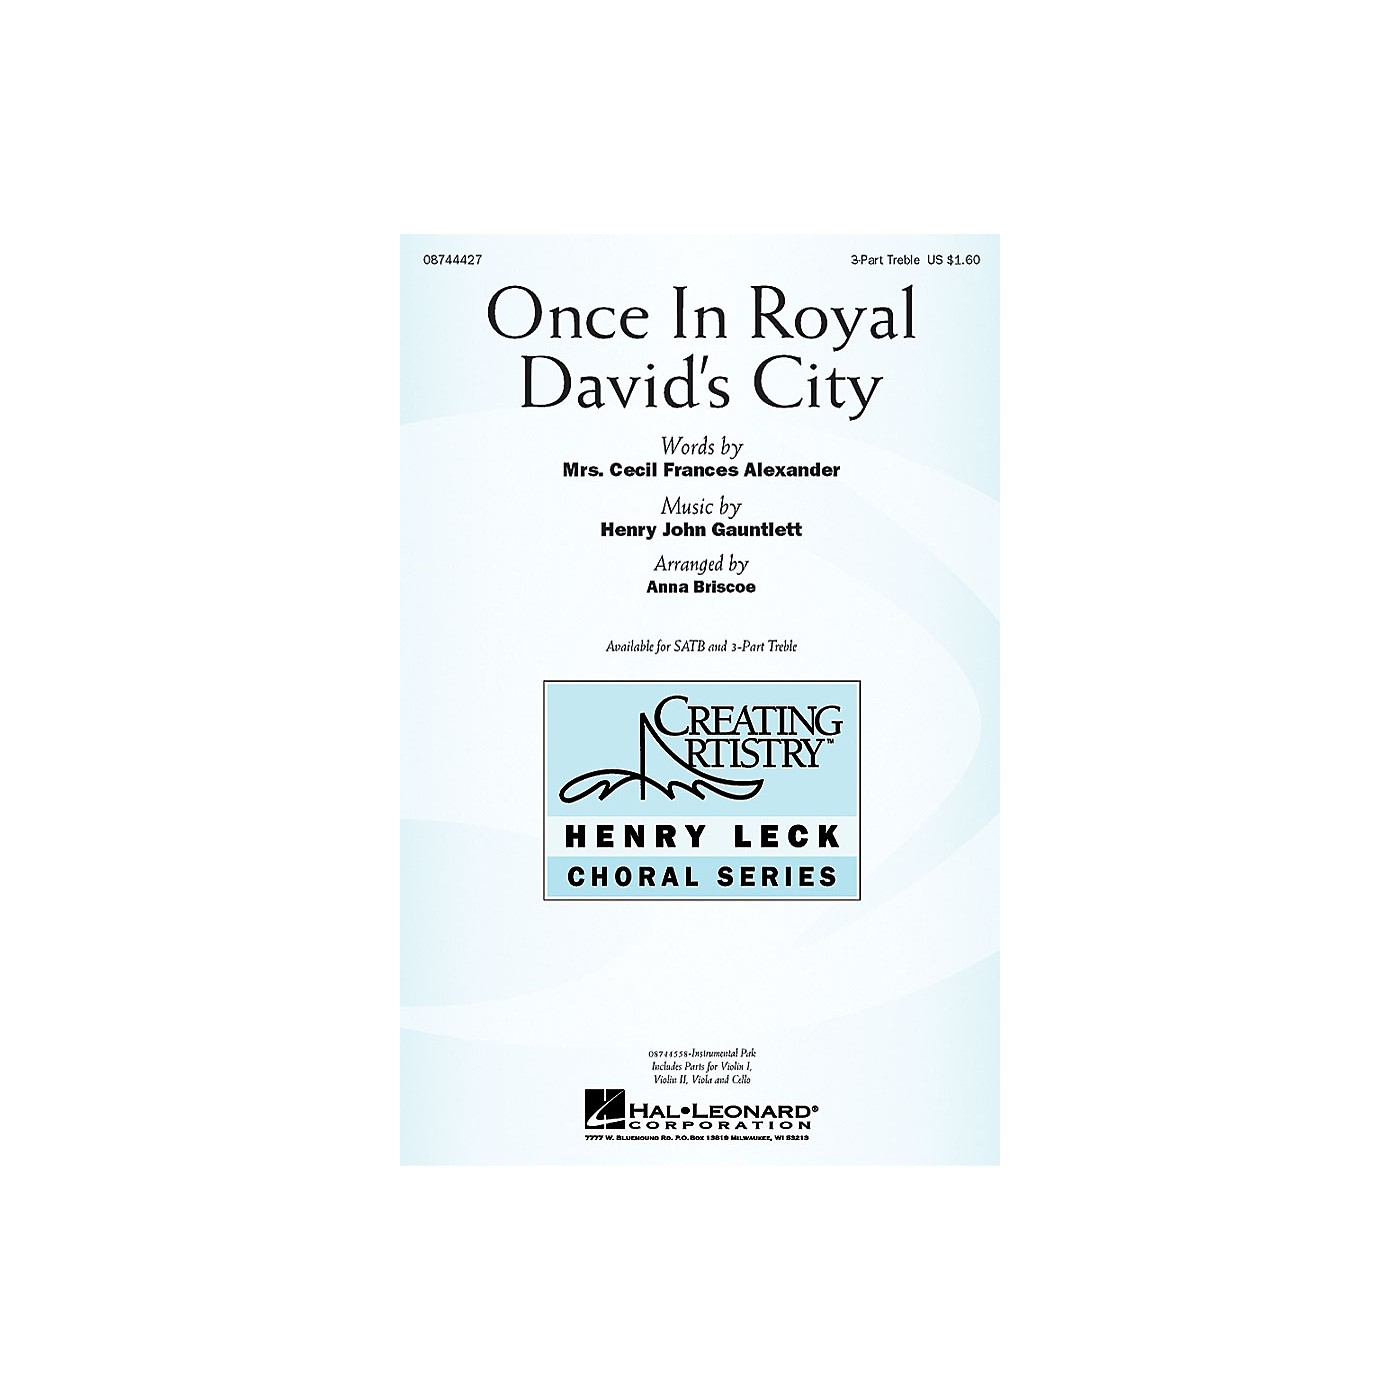 Hal Leonard Once in Royal David's City IPAKS Arranged by Anna Briscoe thumbnail